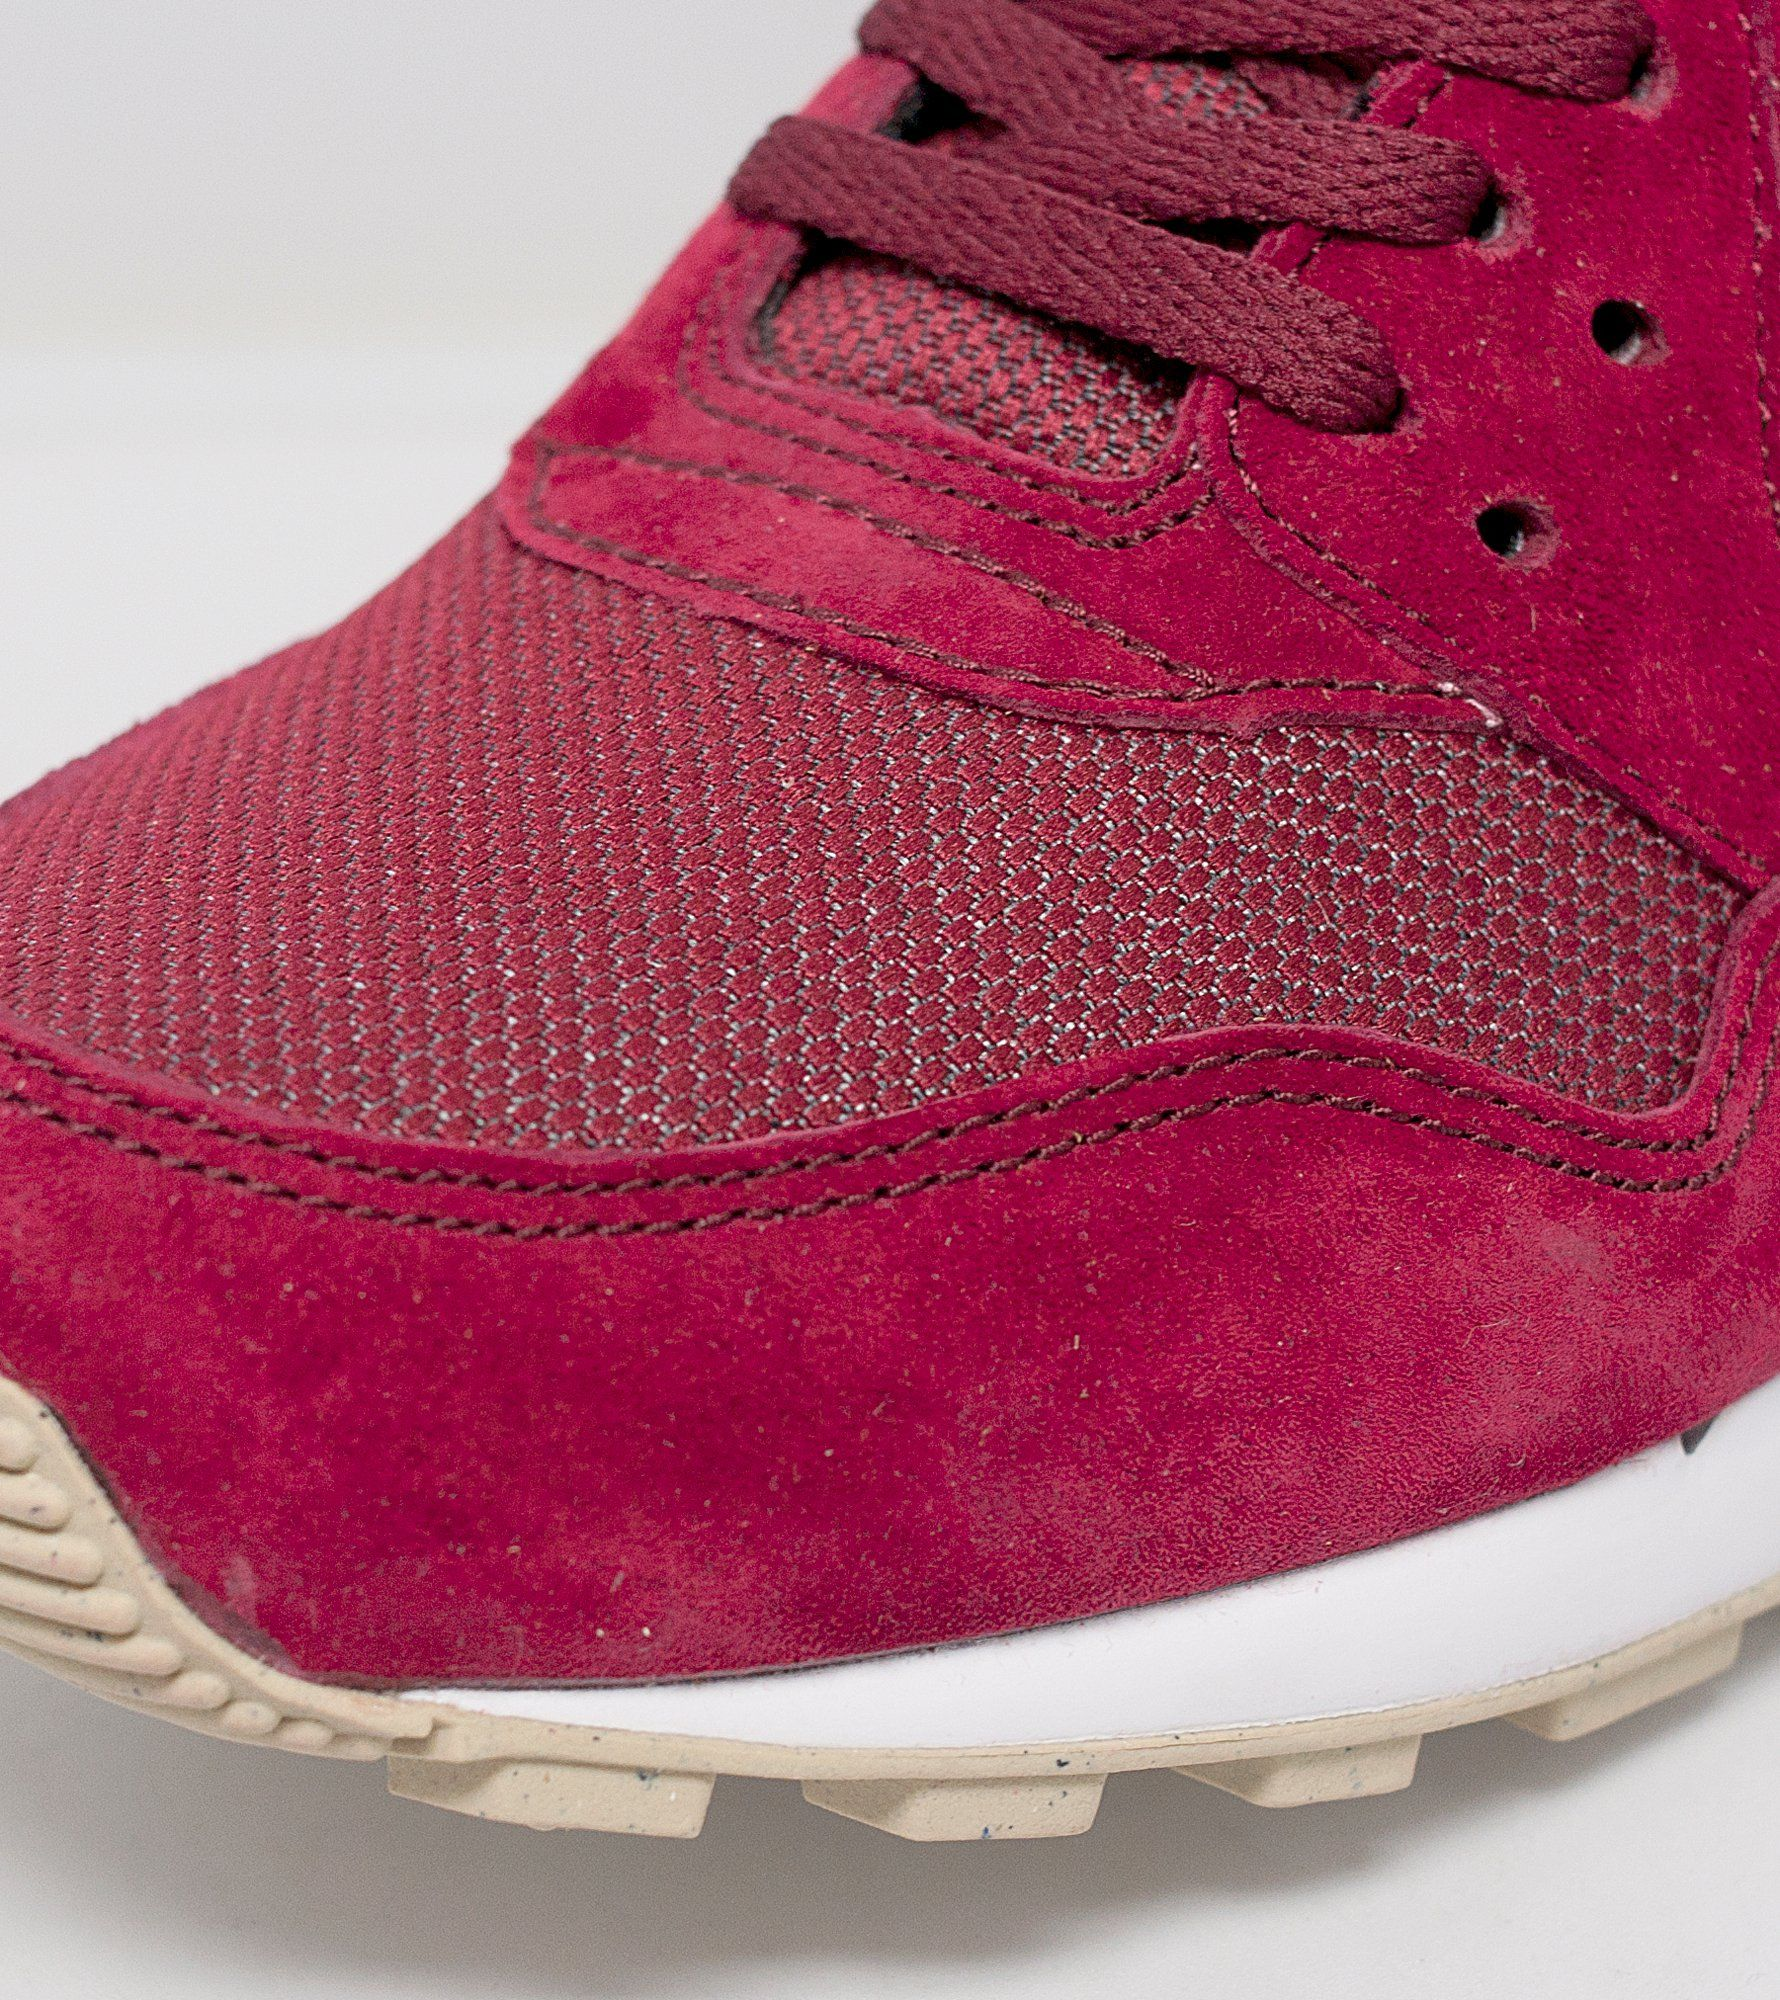 Nike Pegasus 89 PRM - size? Exclusive